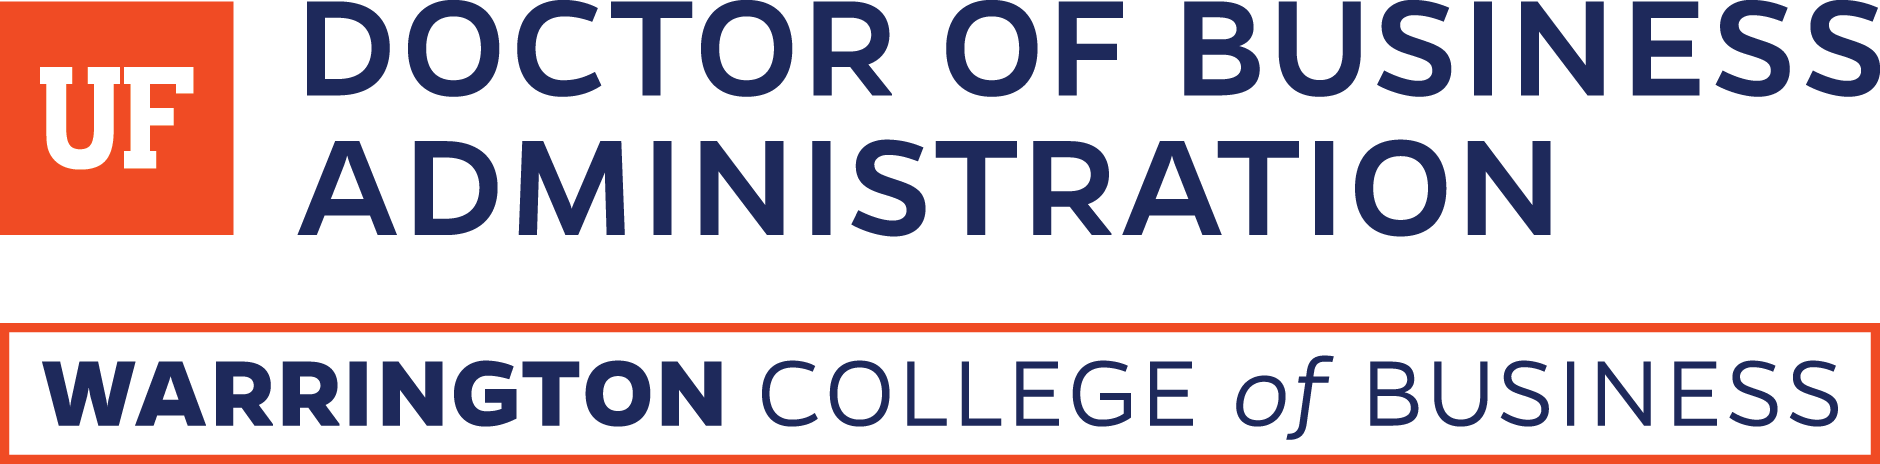 sponsor-logo UF DBA